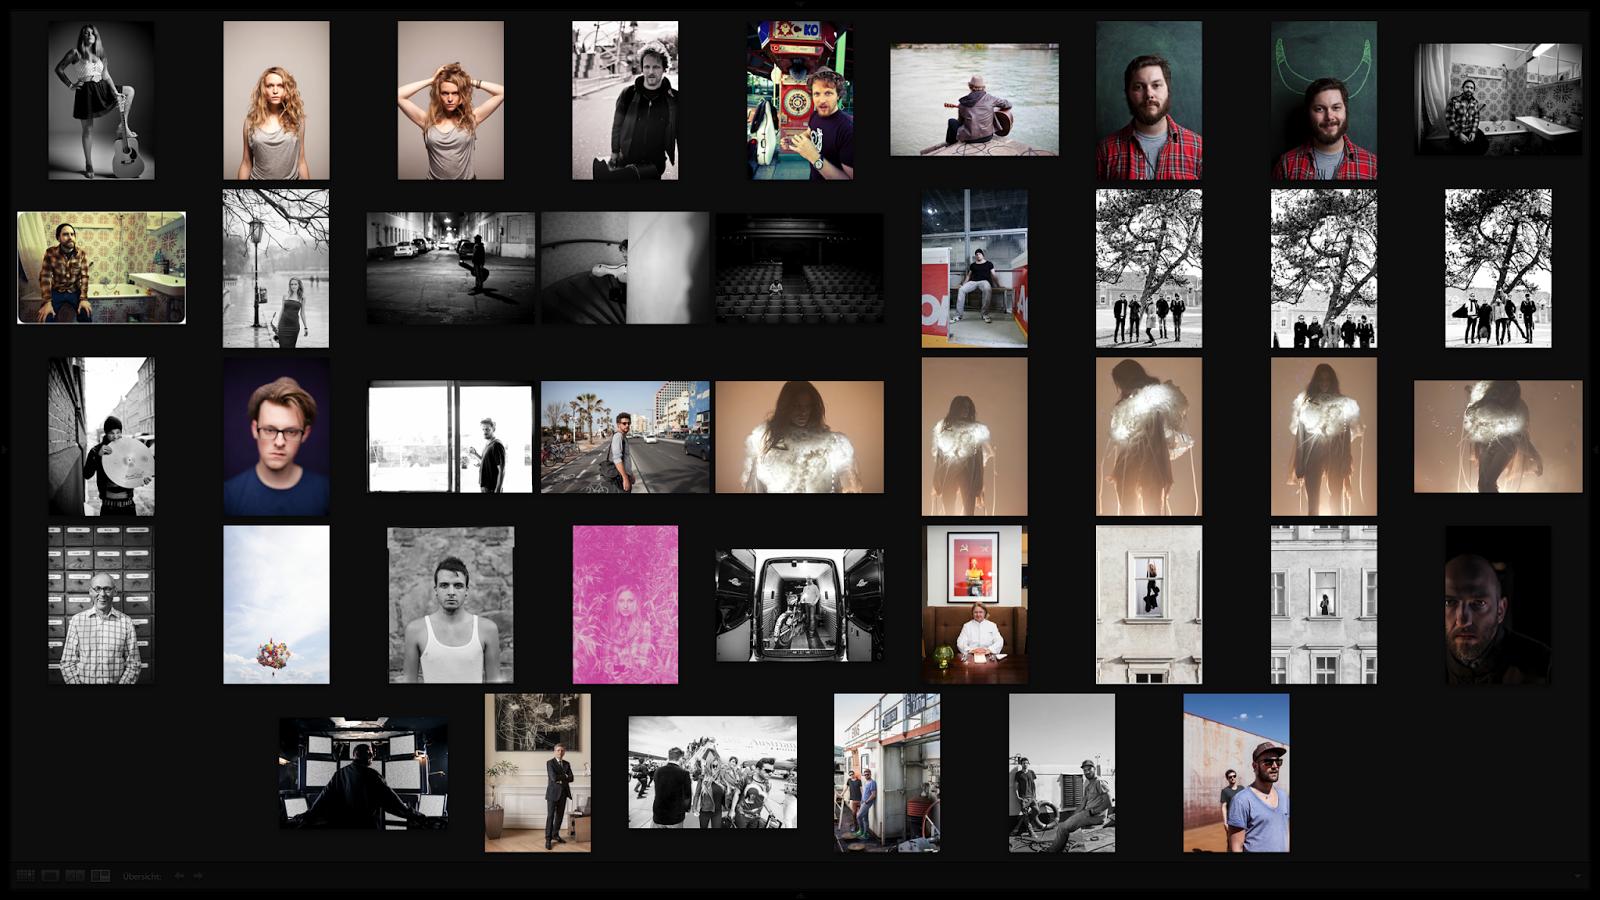 #matthiasheschl #ltag #photography #fotografie #portfolio #portraits